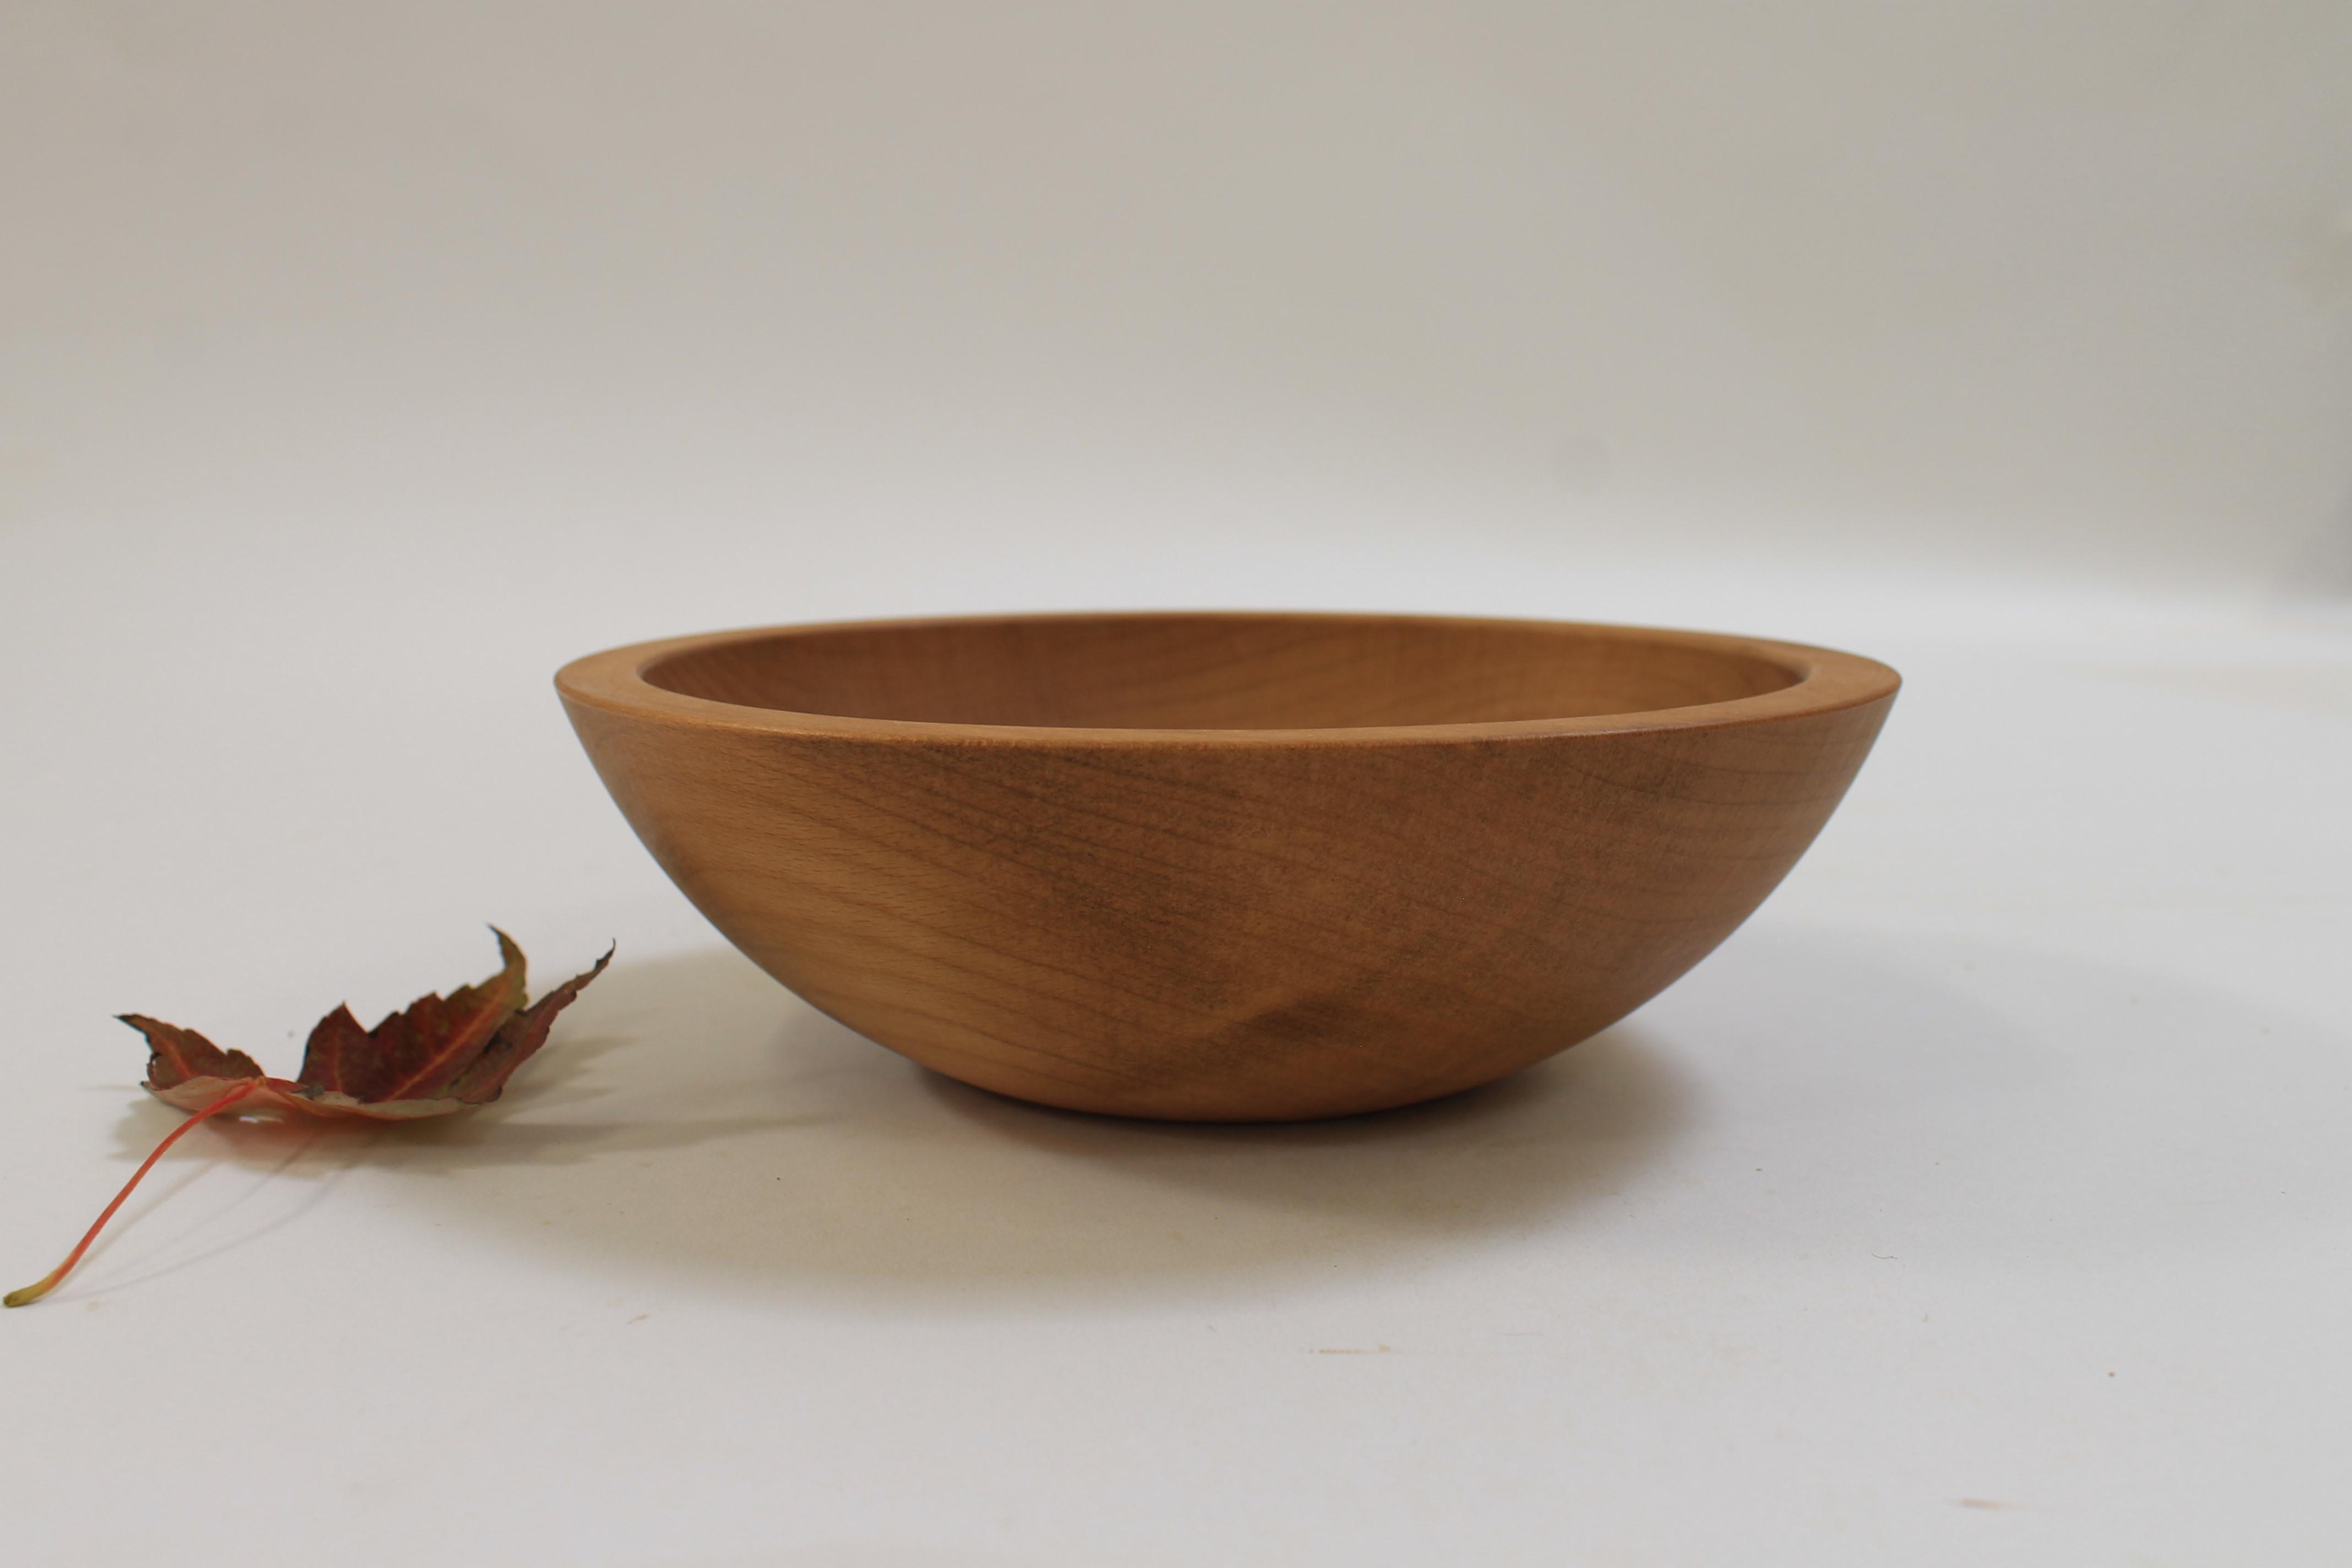 8 inch Beech Bowl - Light Walnut & Bee's Oil Finish 108WBLT